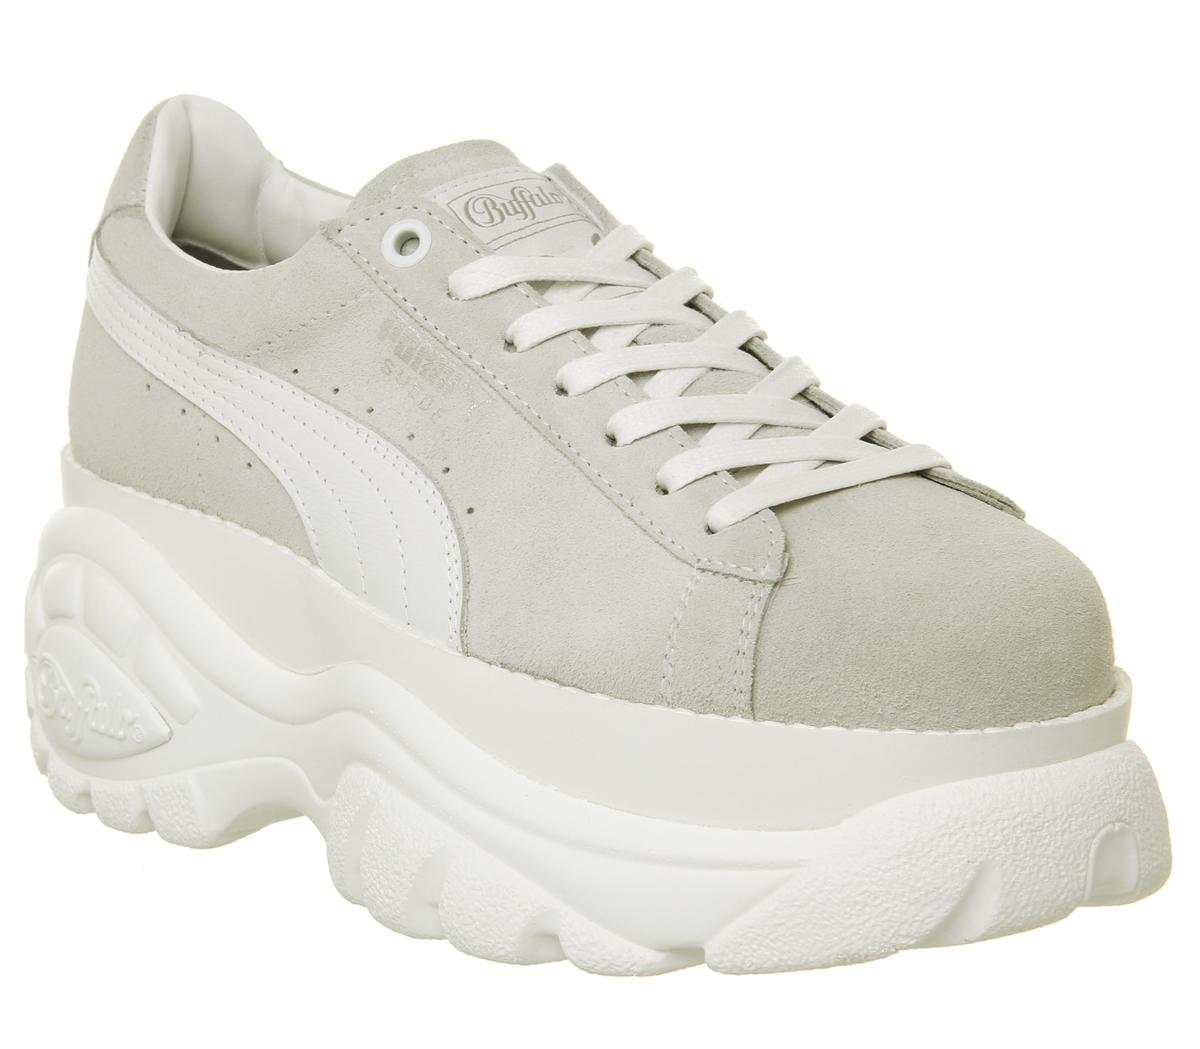 96402dbd24b45 SENTINELLE Womens Puma Suede Puma de Buffalo blanc chaussures formateurs